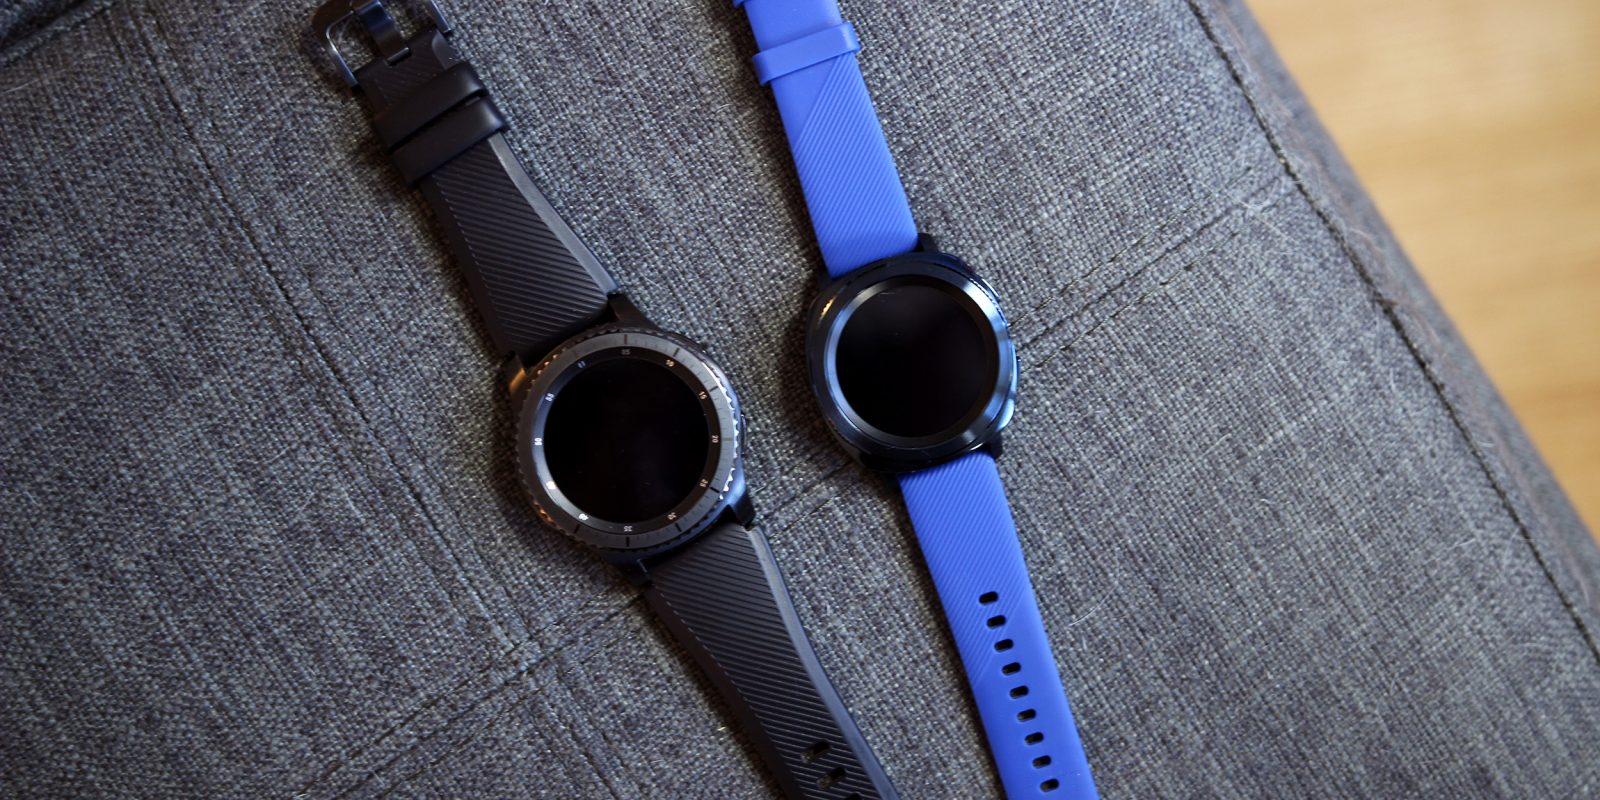 Samsung Gear S3 update brings health, UI improvements